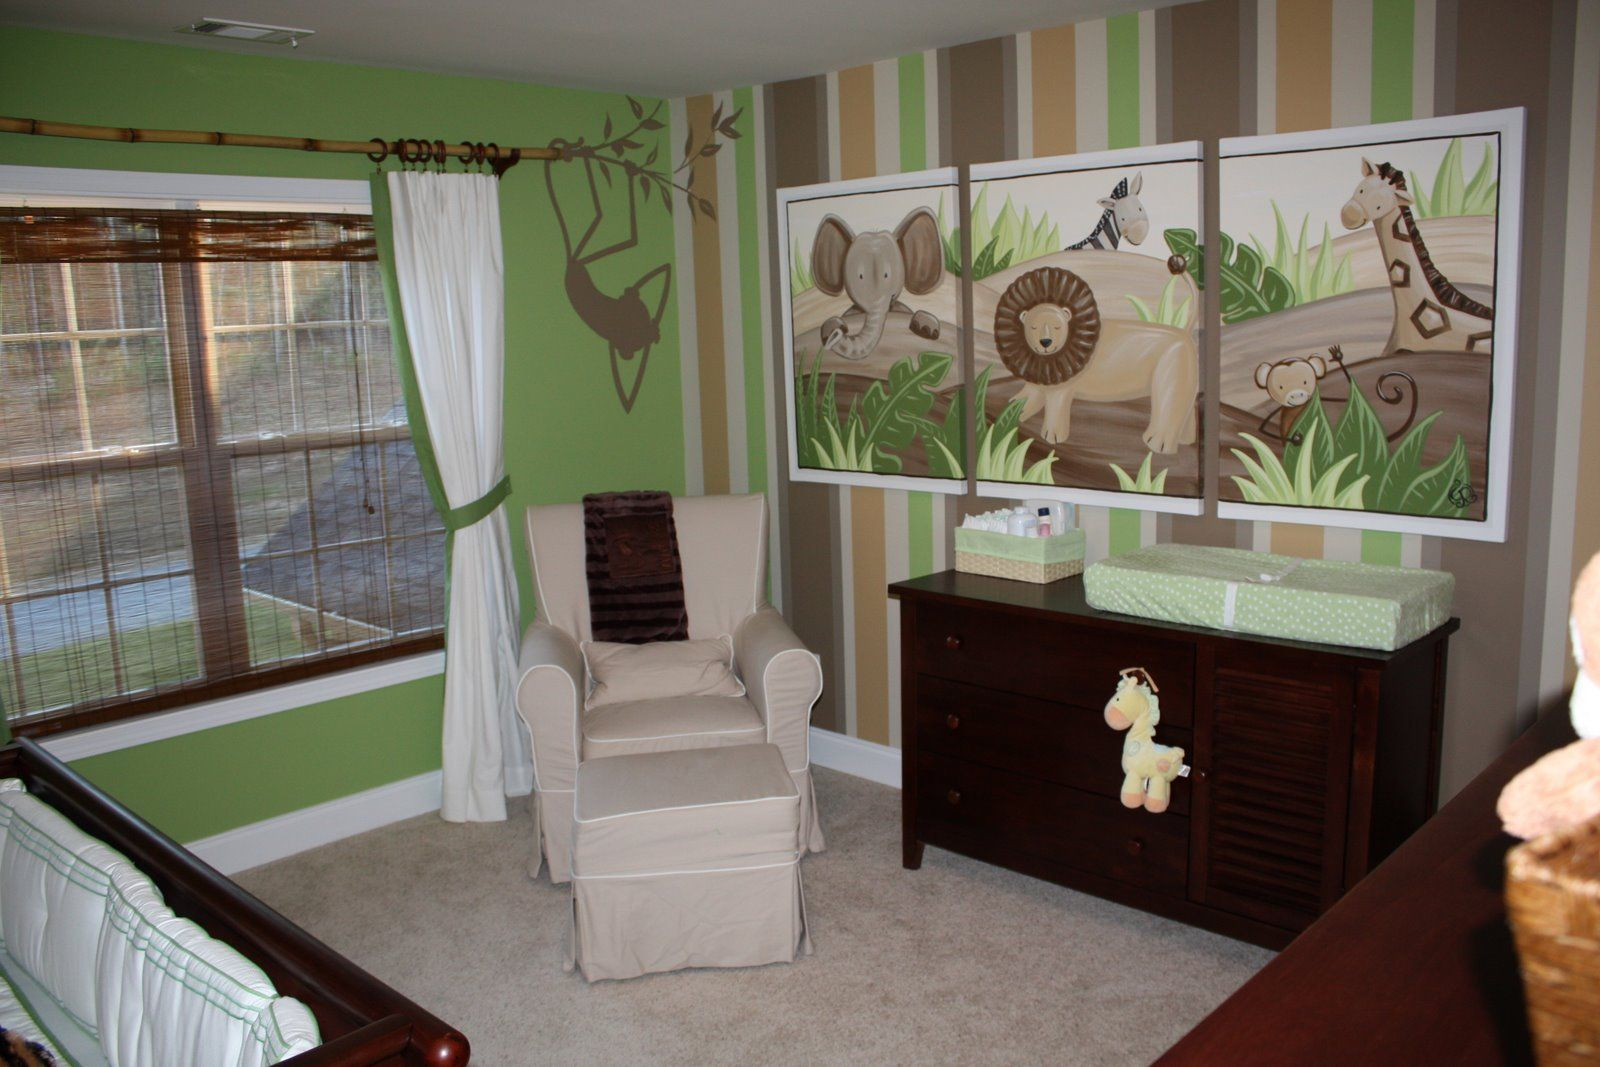 Awesome White Green Wood Glass Modern Design Nursery Ideas For Boys Baby  Boy Windows Rail Wood. Awesome White Green Wood Glass Modern Design Nursery Ideas For